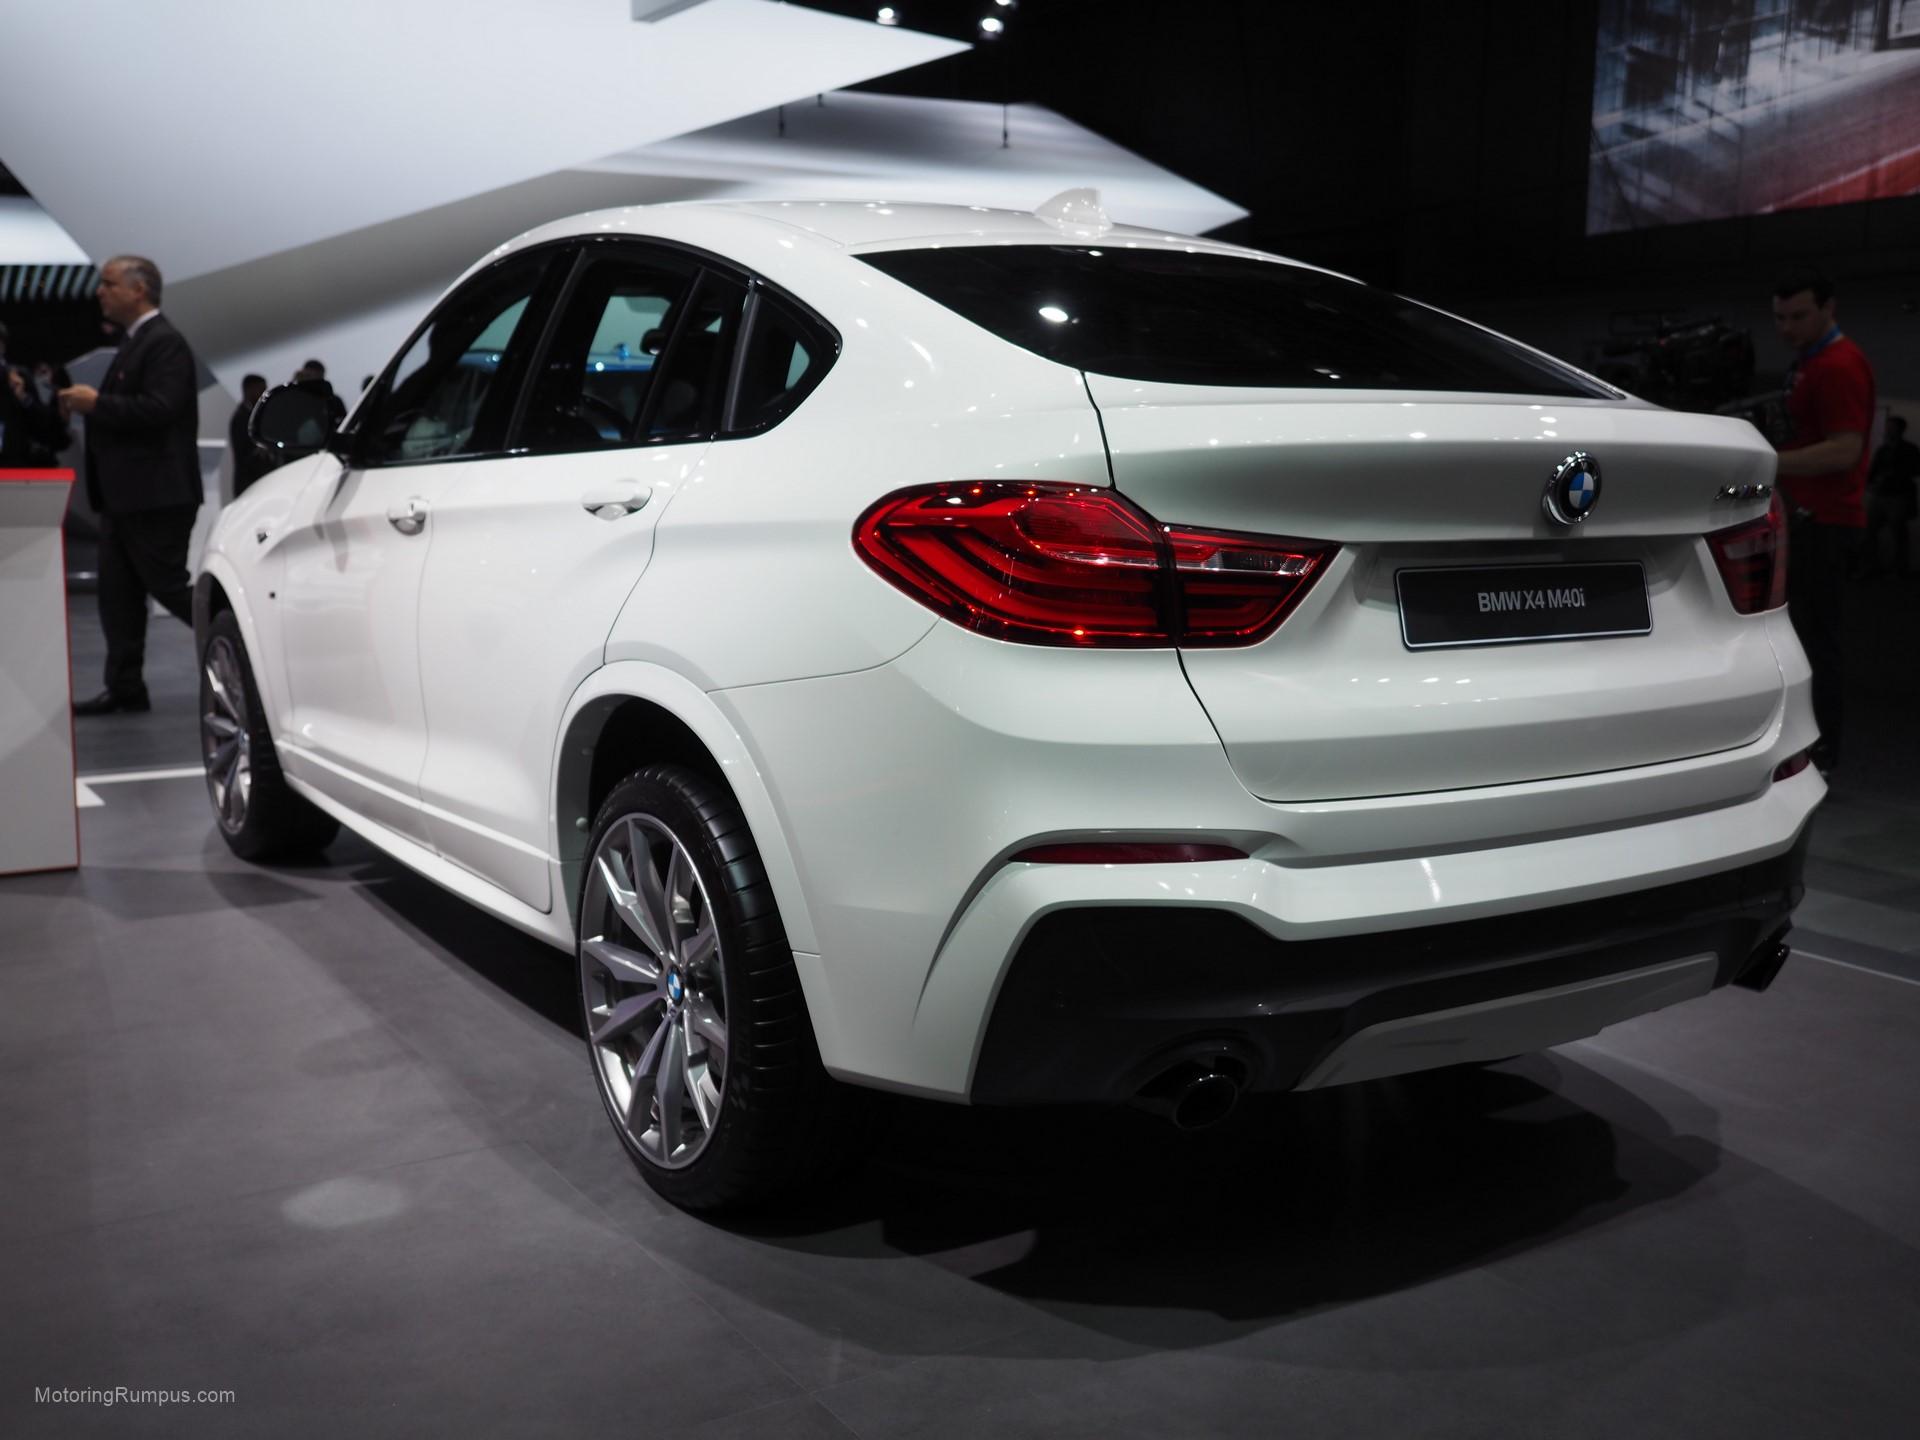 2016 NAIAS BMW X4 M40i Rear